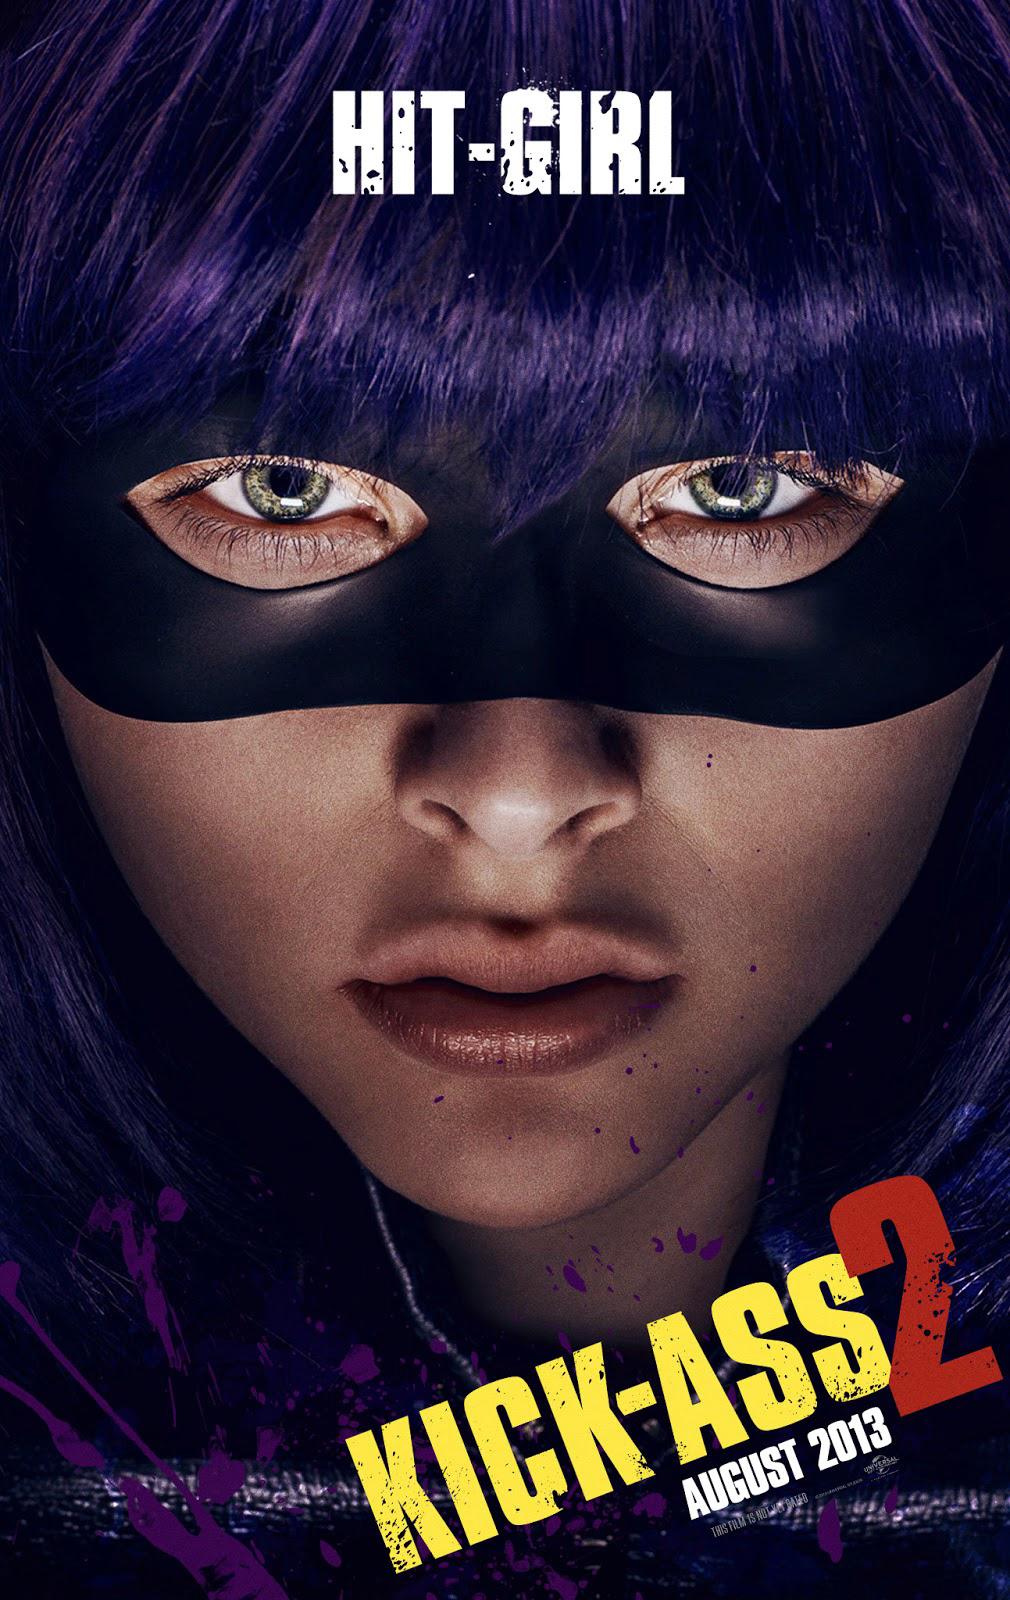 Kick-Ass 2 - Movie Poster #6 (Original)